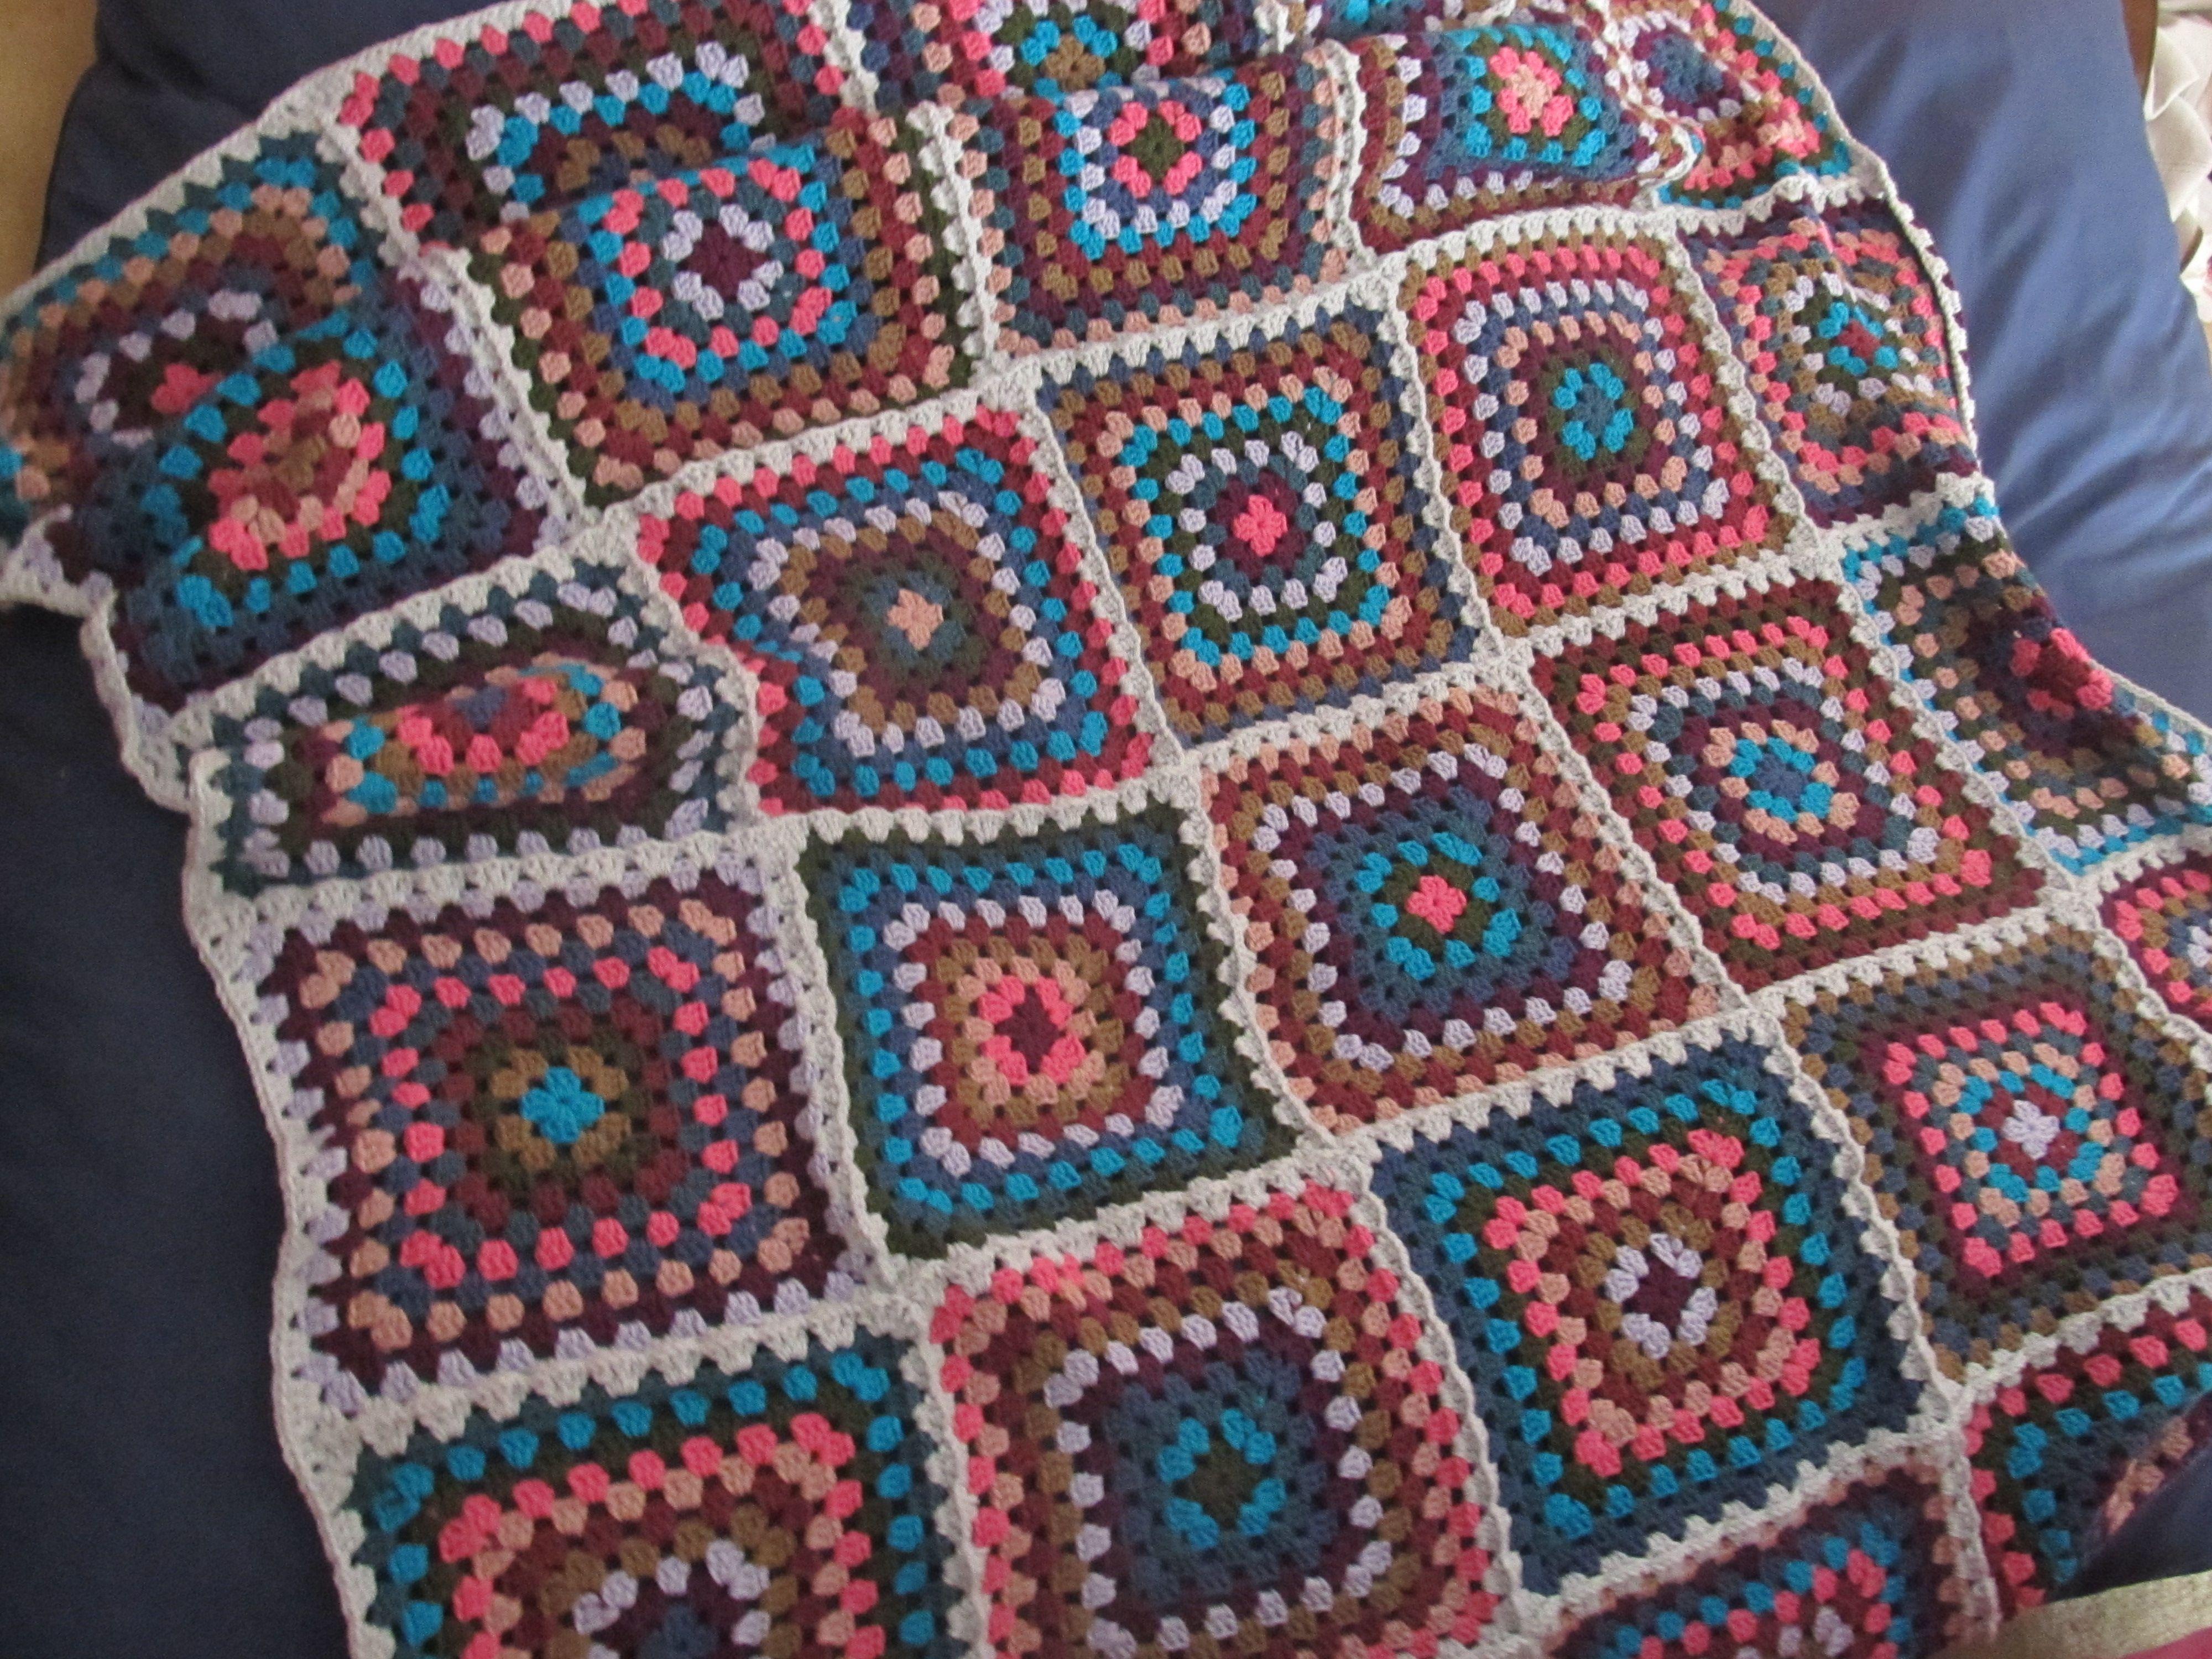 Crochet blanket i made for my boyfriends birthday